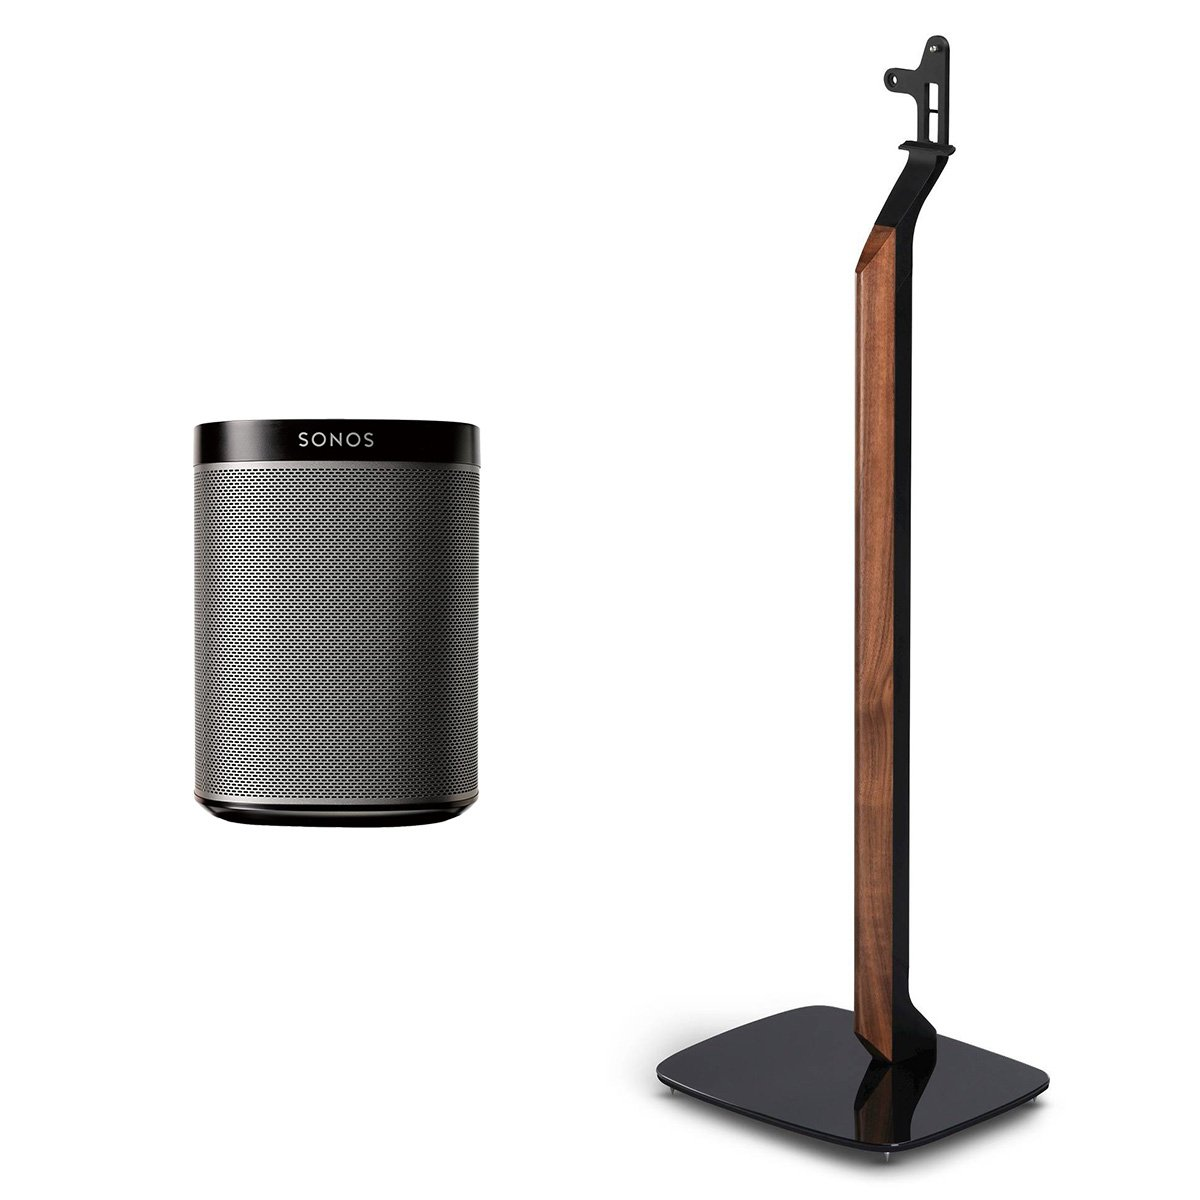 Sonos PLAY:1 All-In-One Wireless Music Speaker with Flexson Premium Floor Stand (Black)